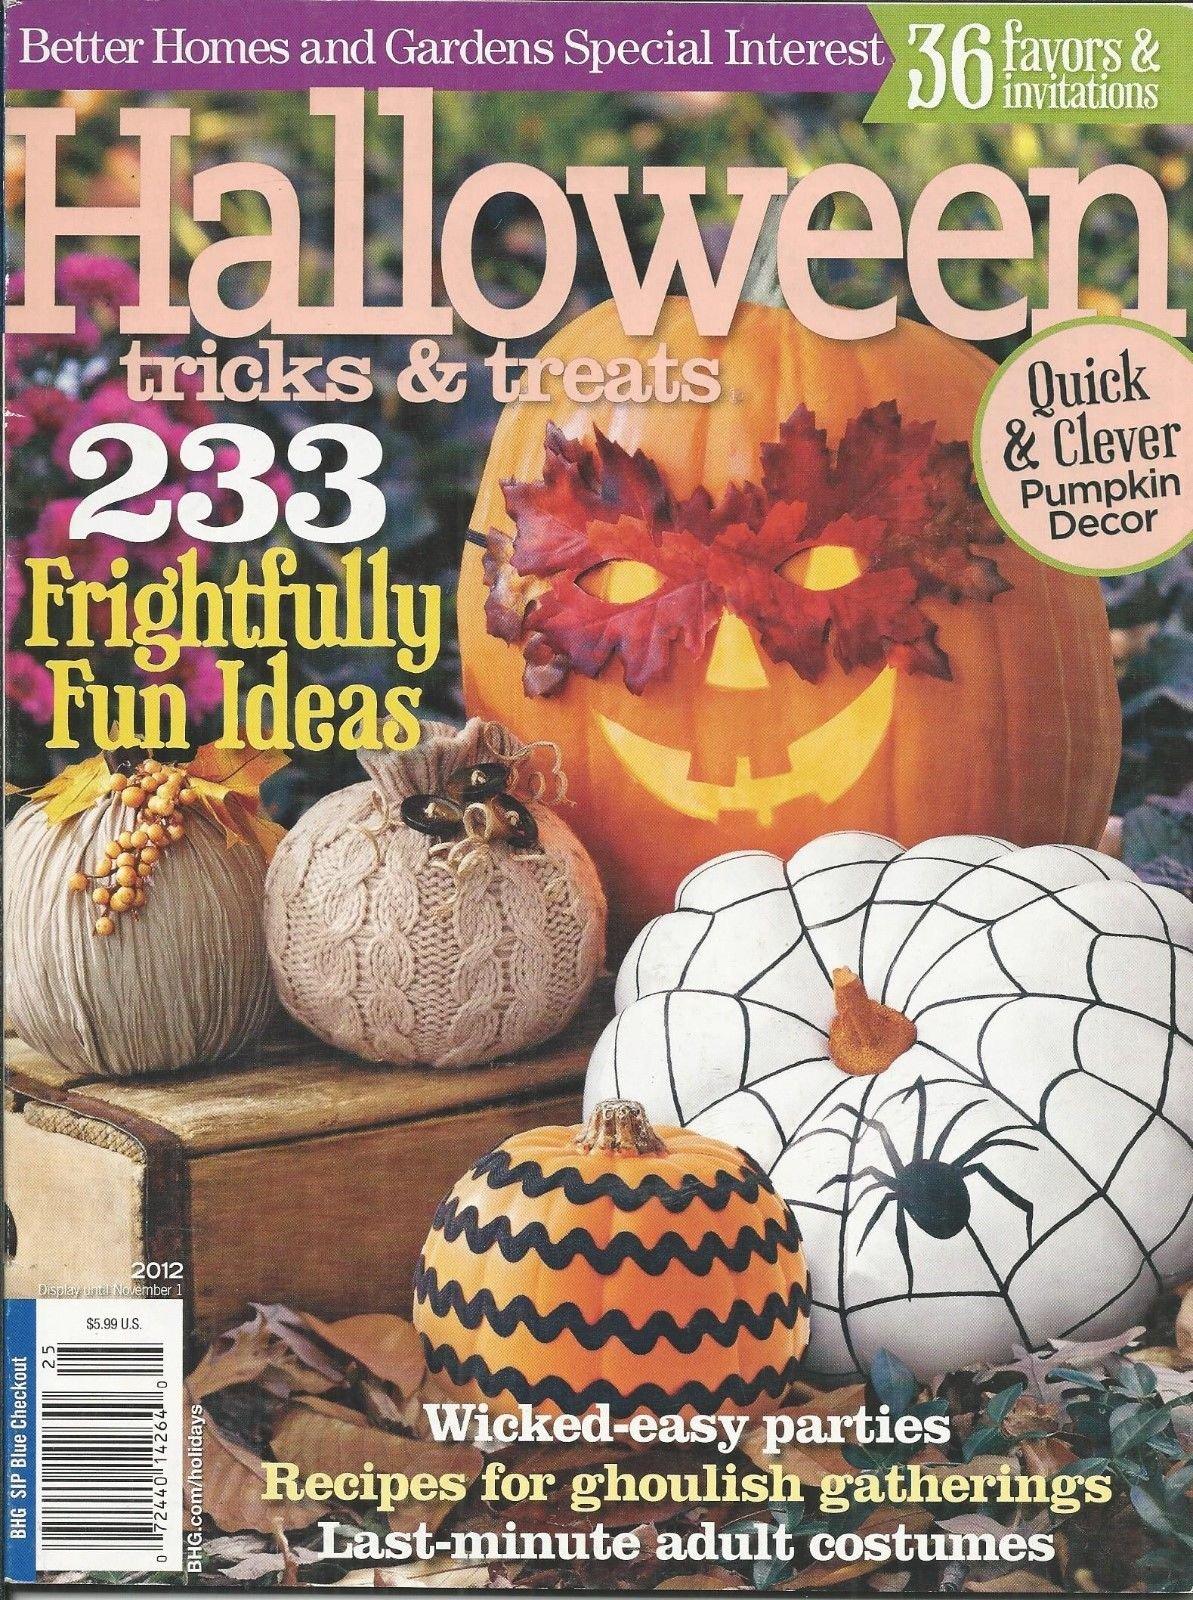 Download Halloween Tips and Tricks magazine 2012 ebook